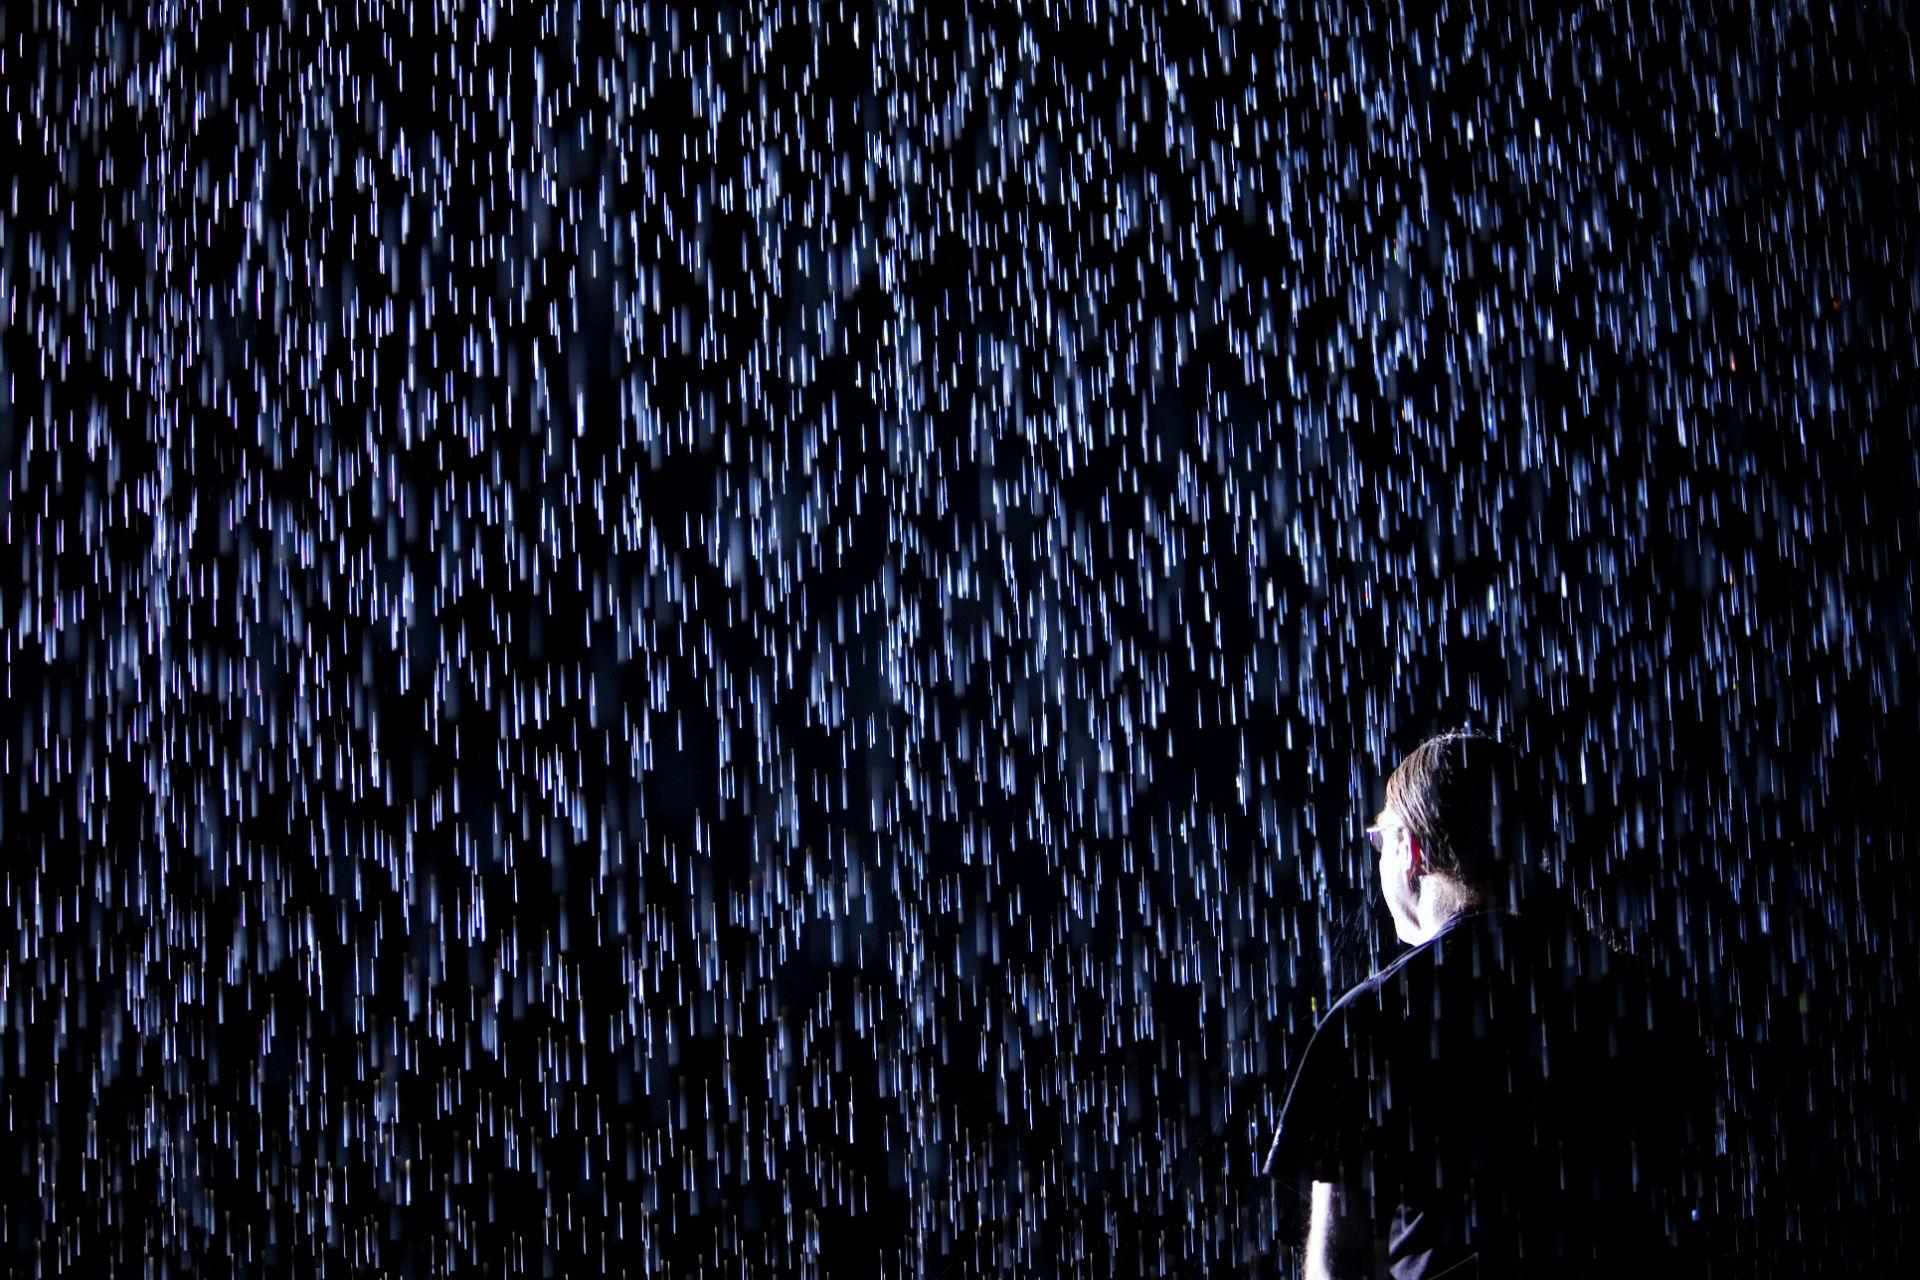 rainy mood wallpaper hd